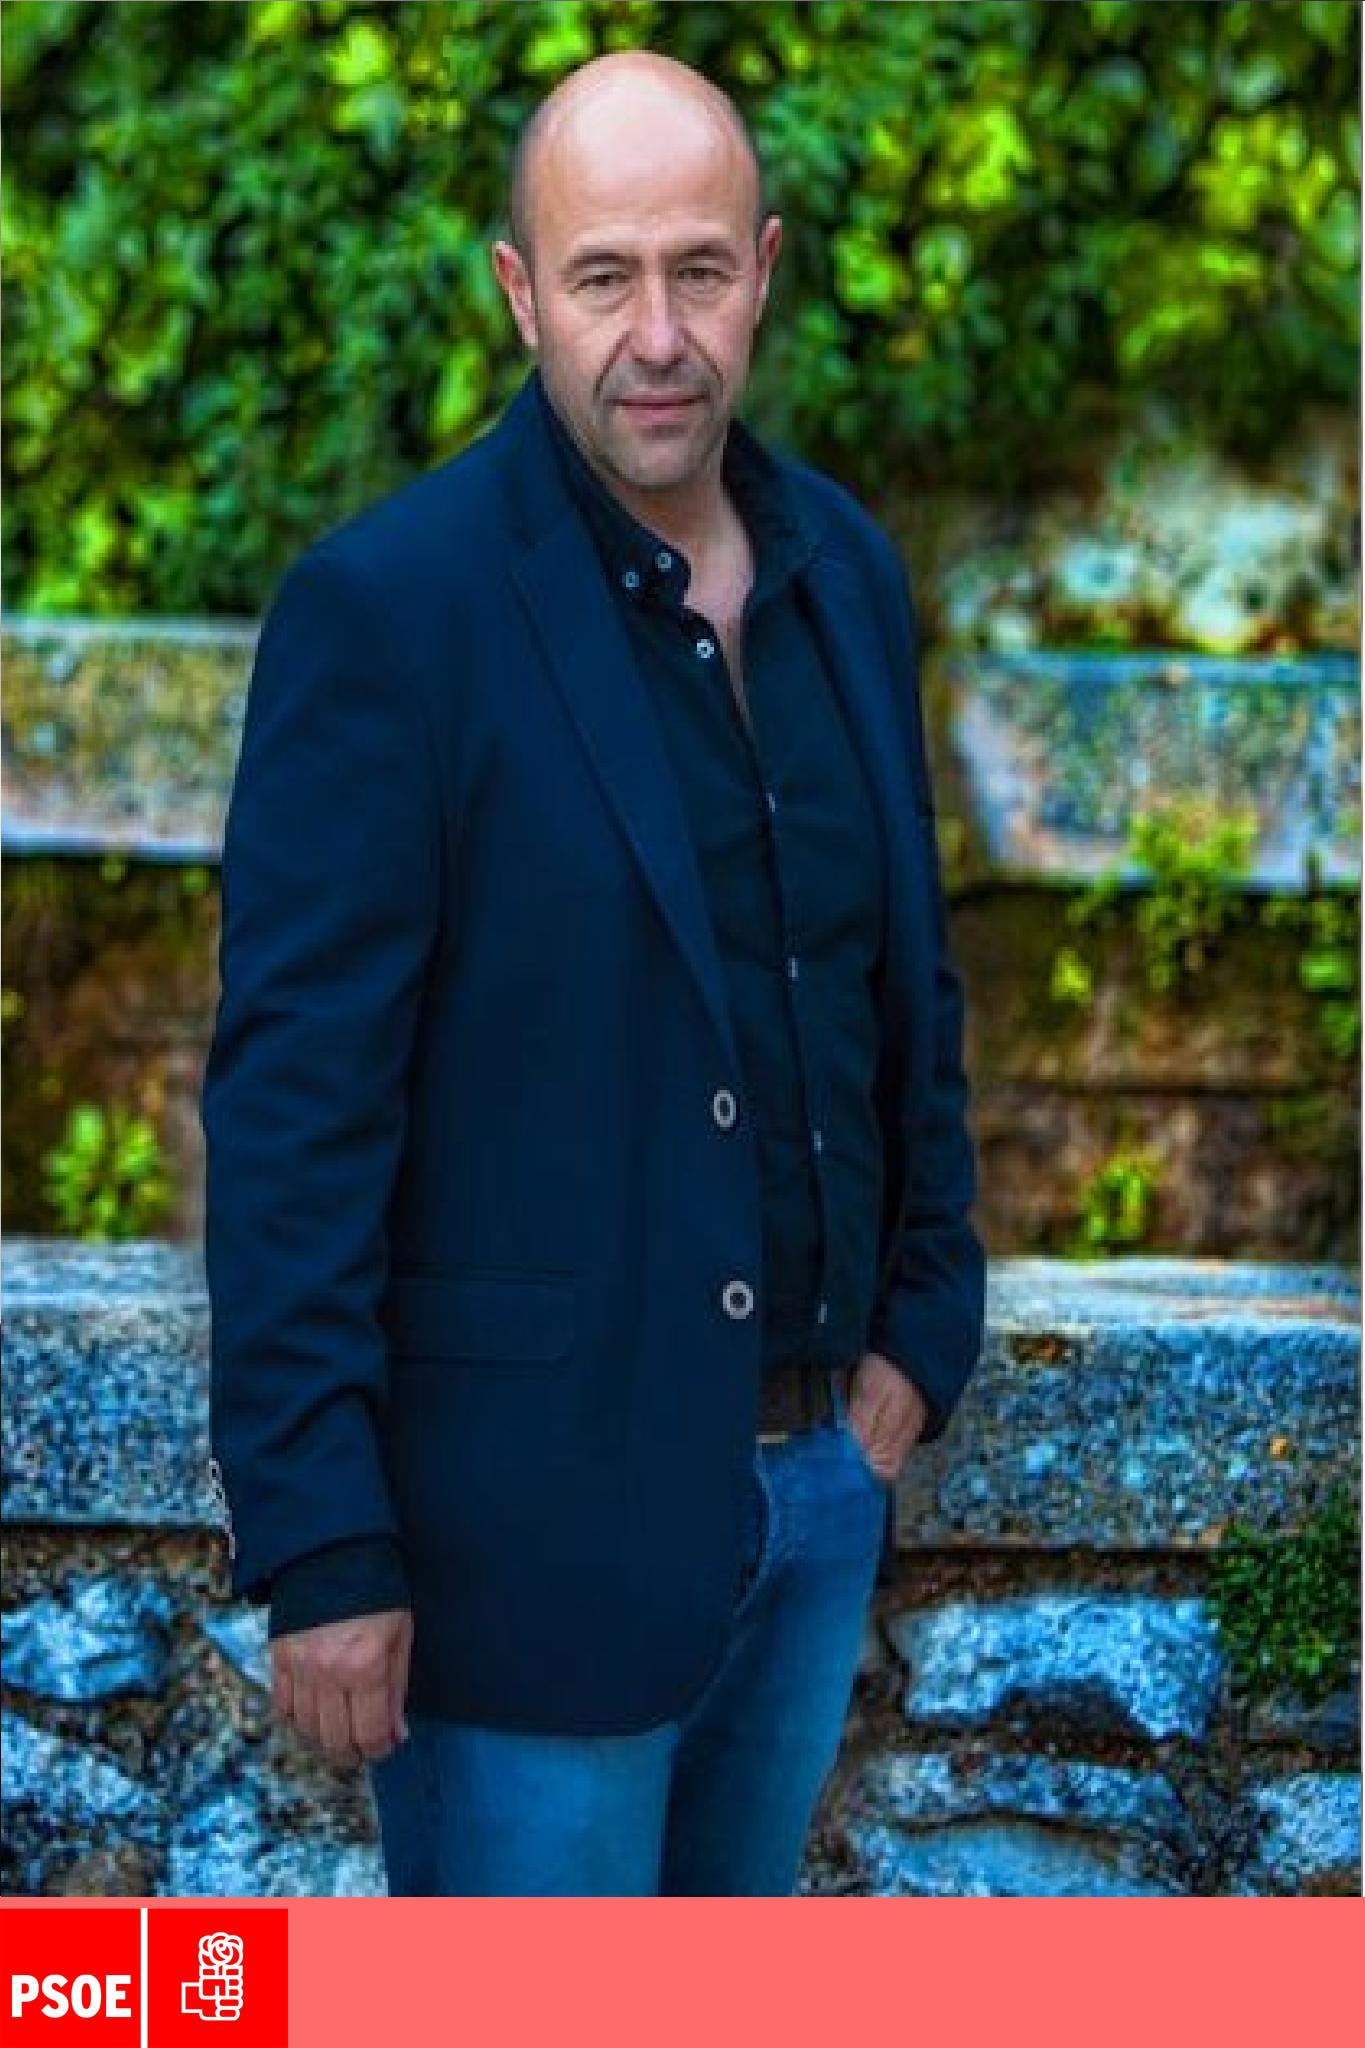 Jose Luis Olivares Melero